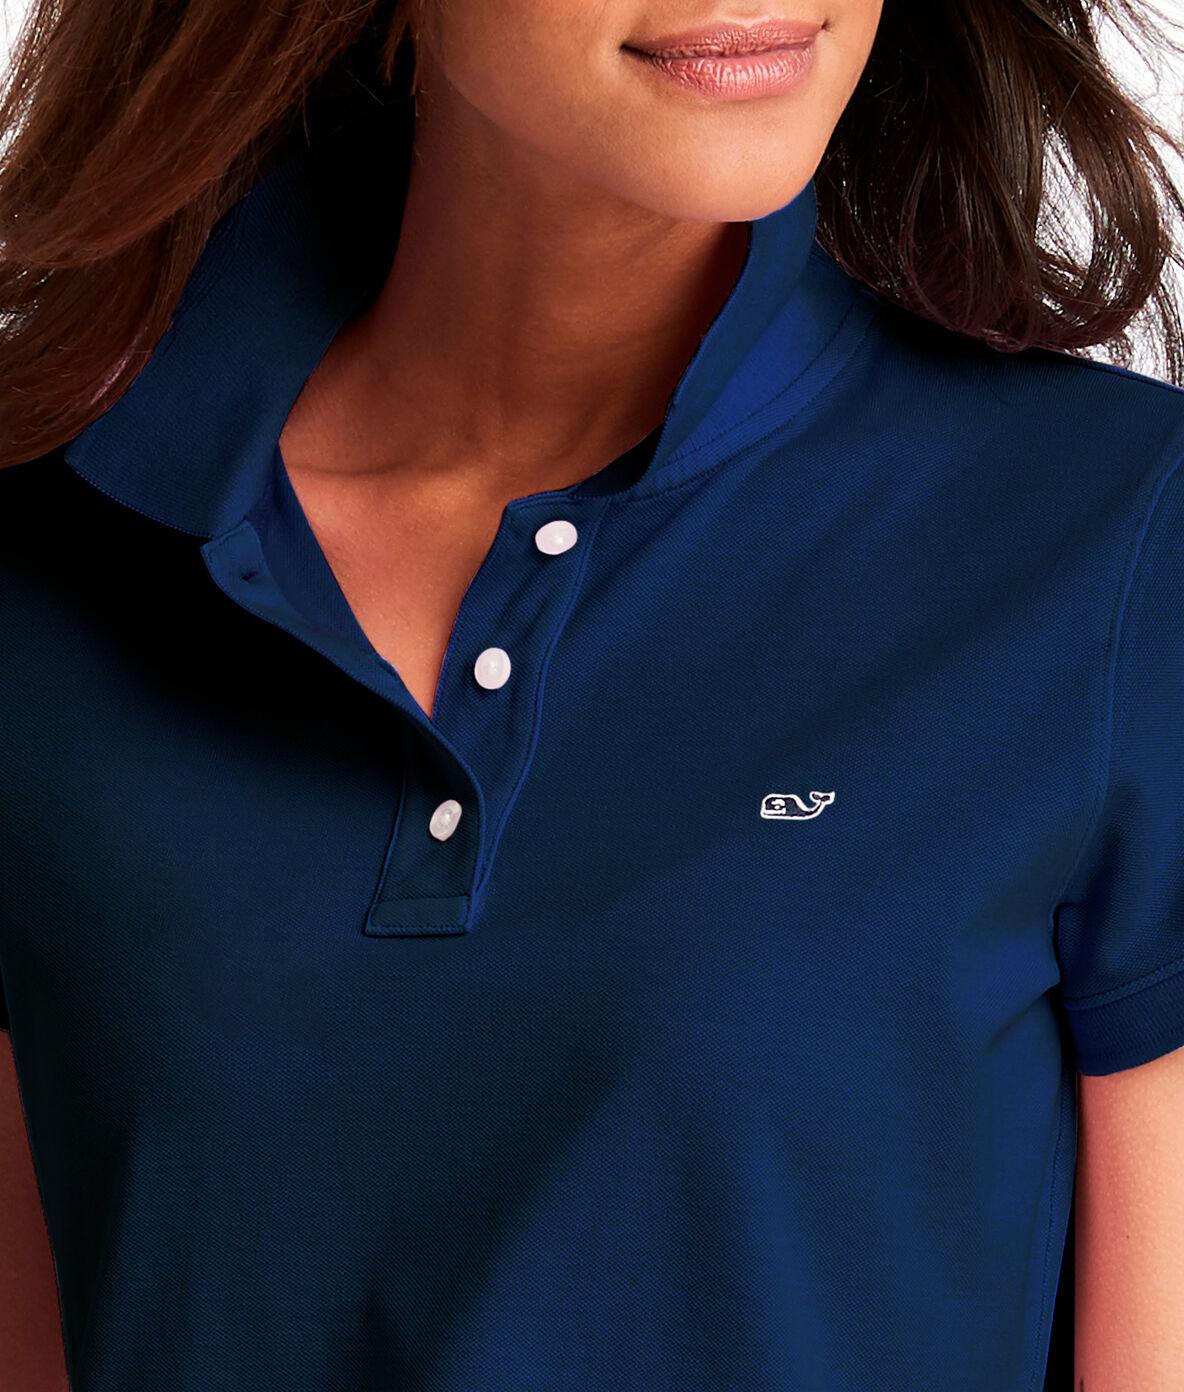 Vineyard Vines Women/'s Polo Shirt Large NWT Short Sleeves Nautical Navy Blue L